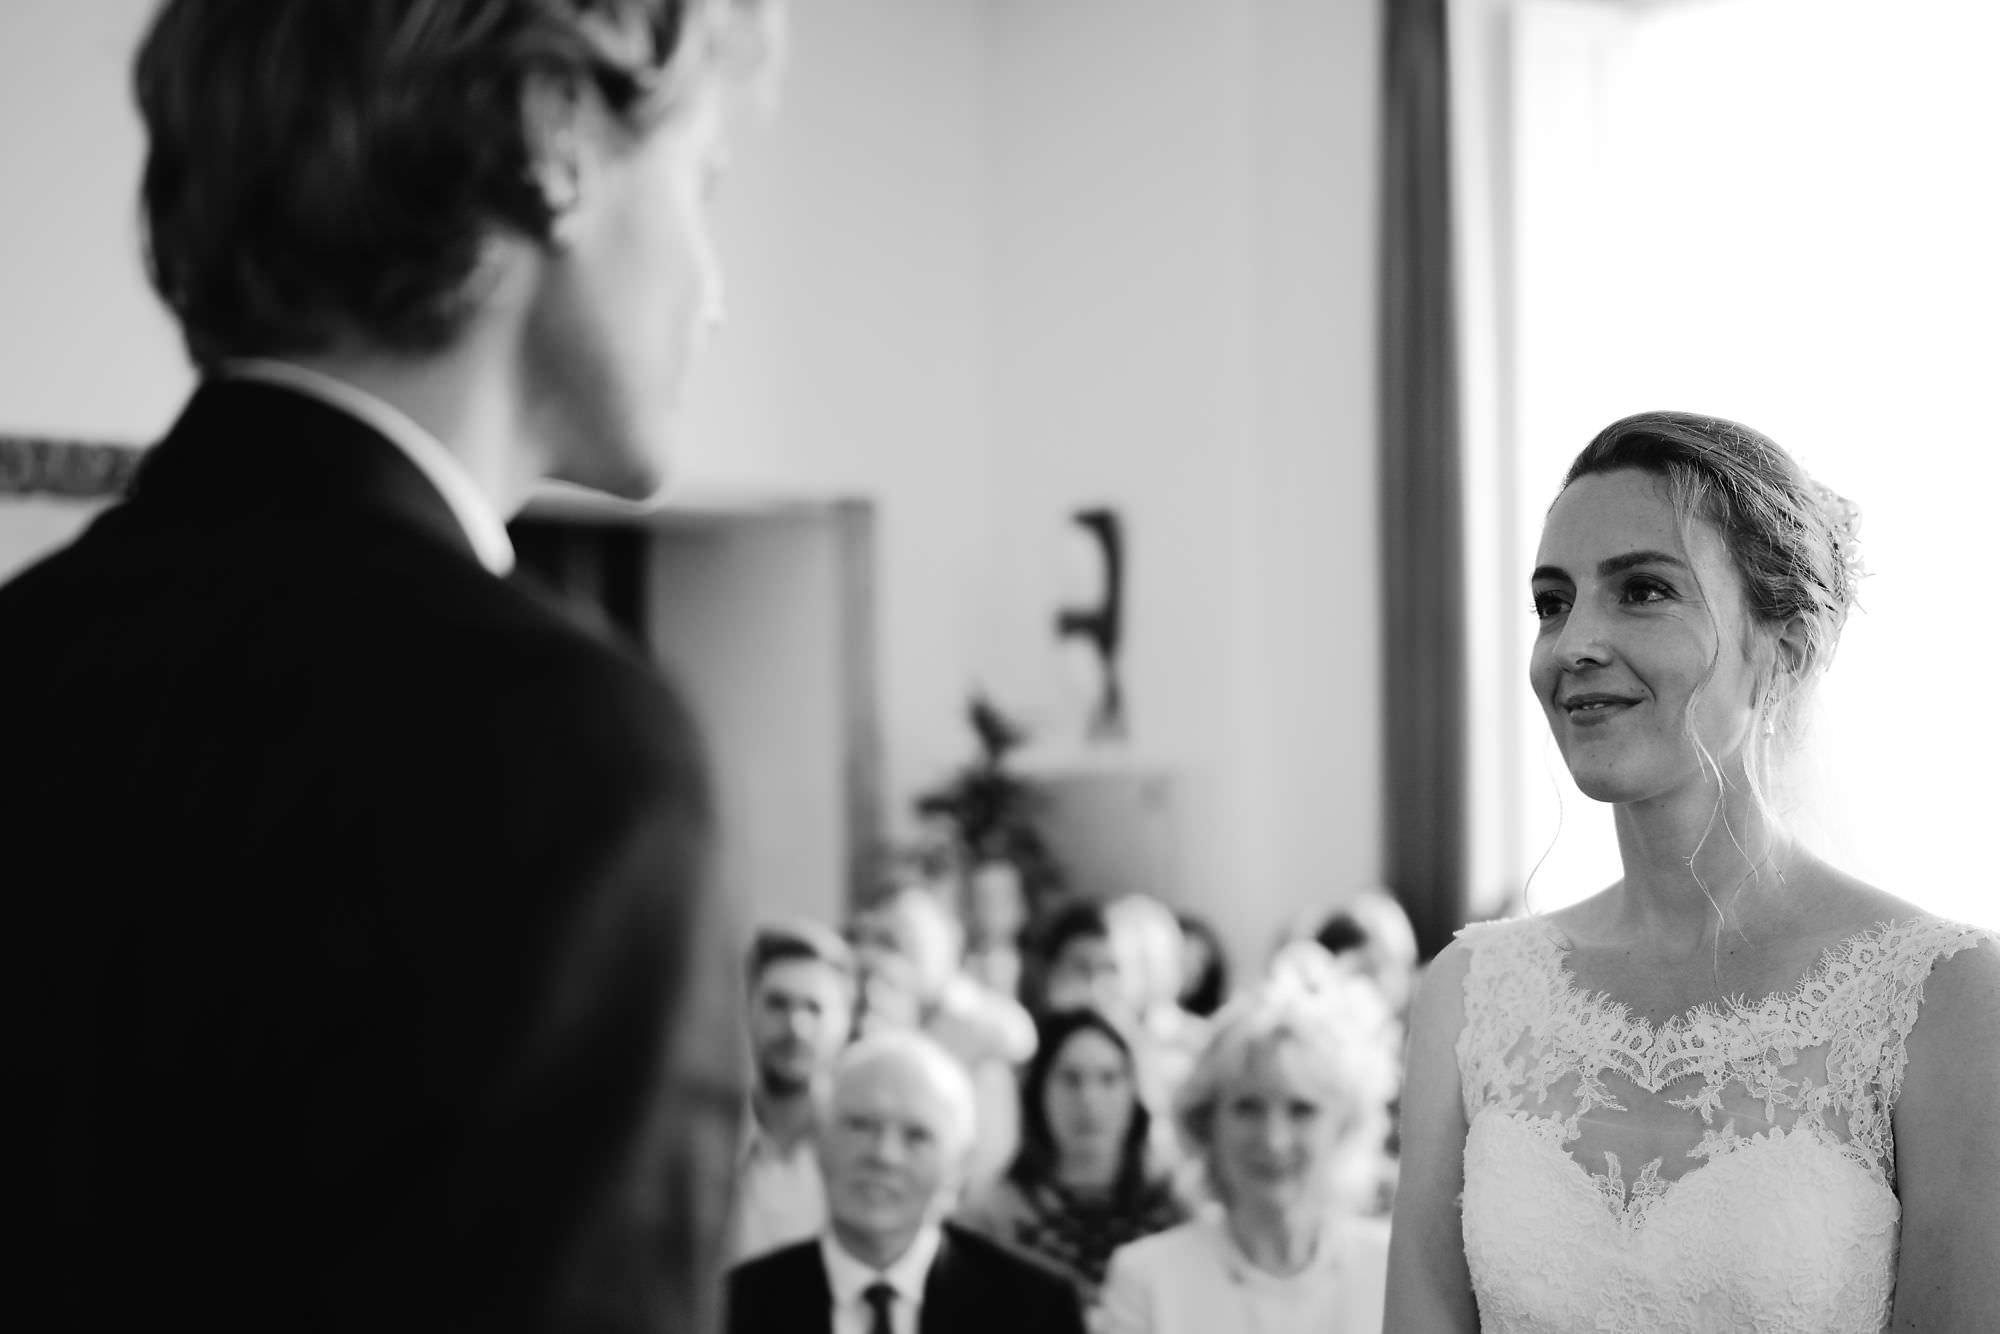 amsterdam wedding photographer mark hadden utrecht the netherlands